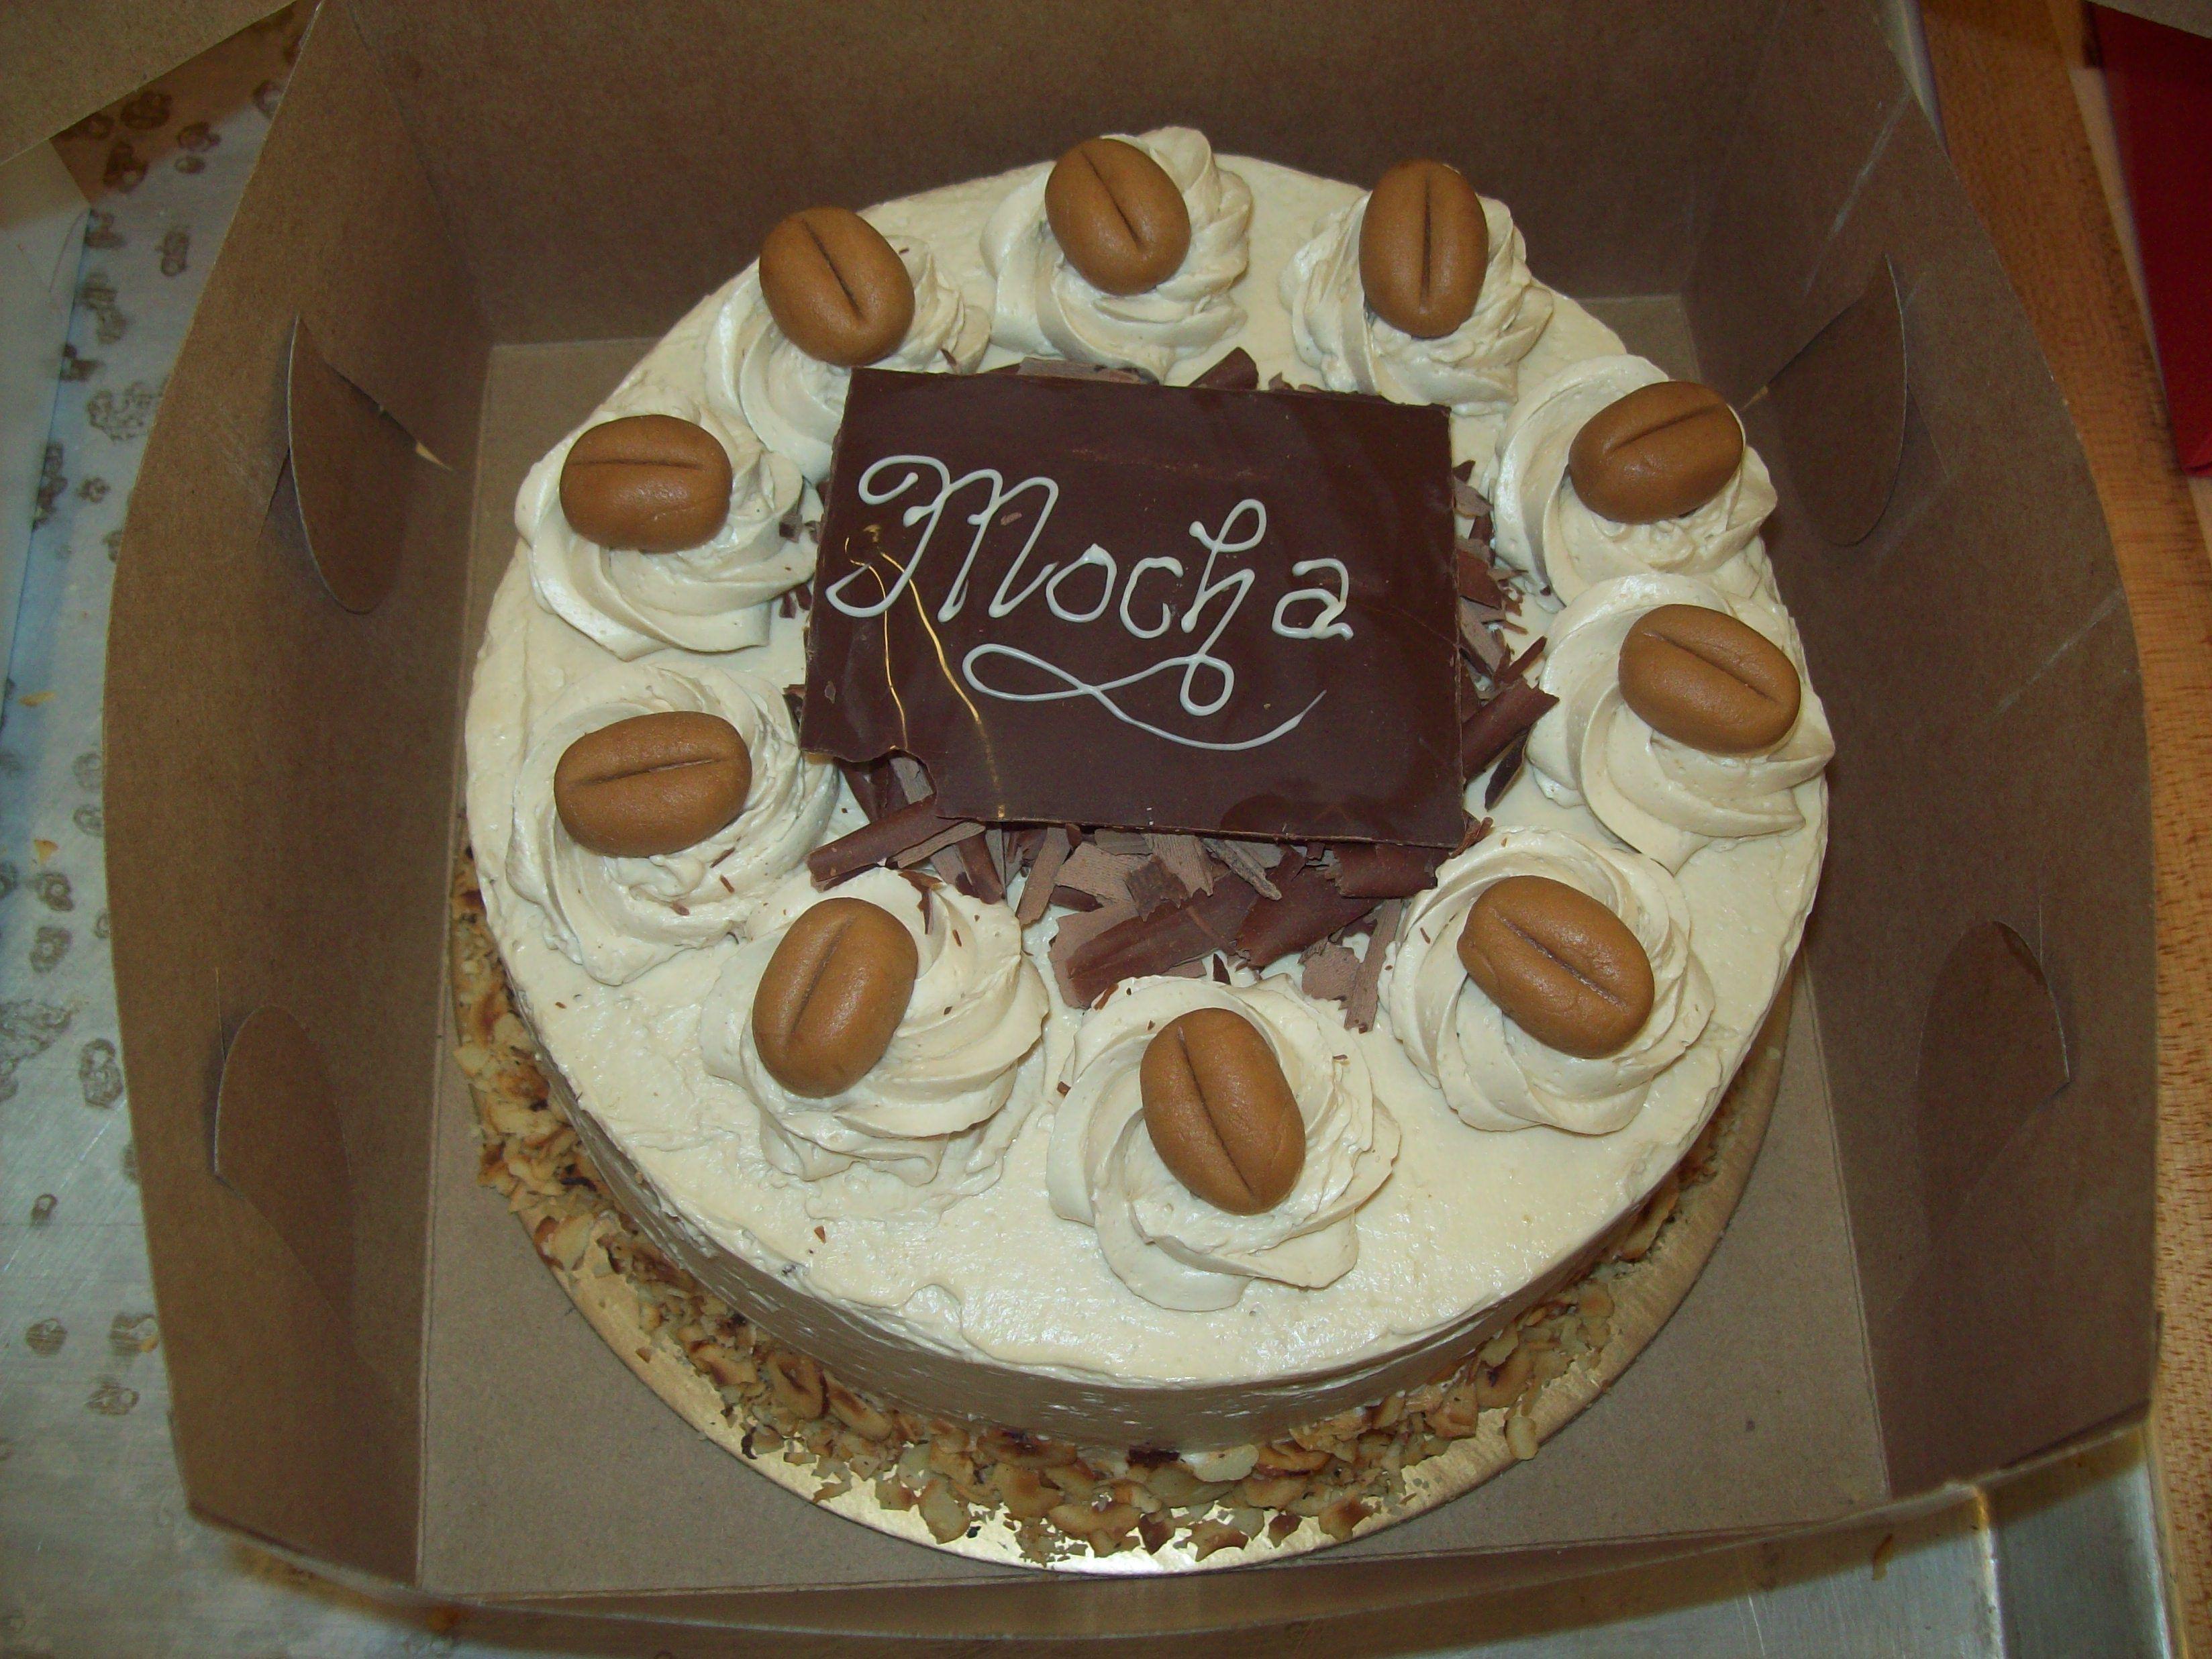 Mocha Chocolate Cake With Marzipan Coffee Bean Decorations Chocolate Mocha Cake Baking Cake